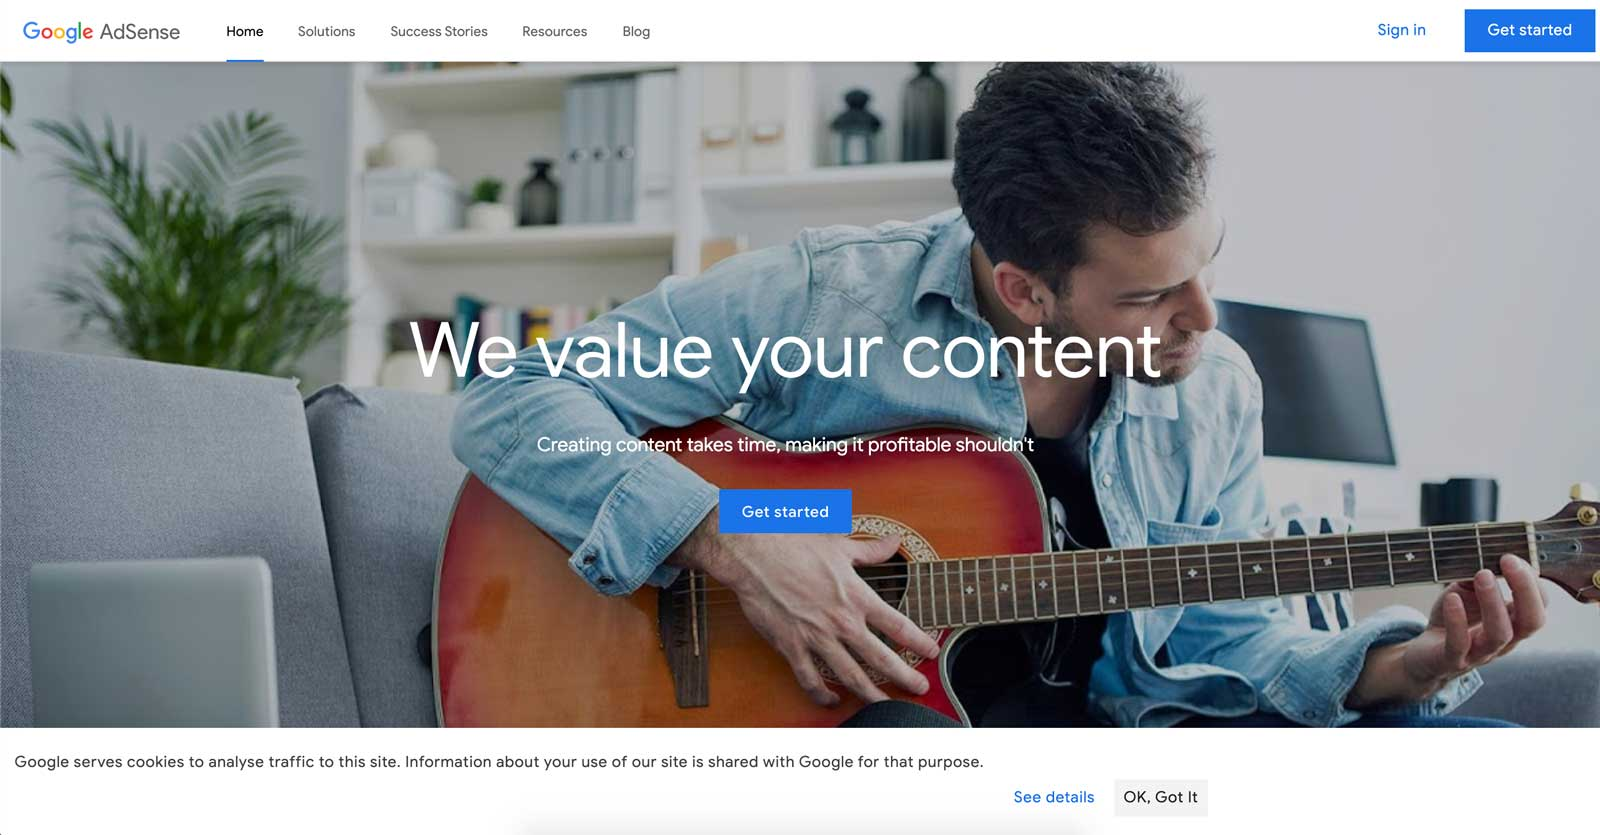 google adsense homepage design